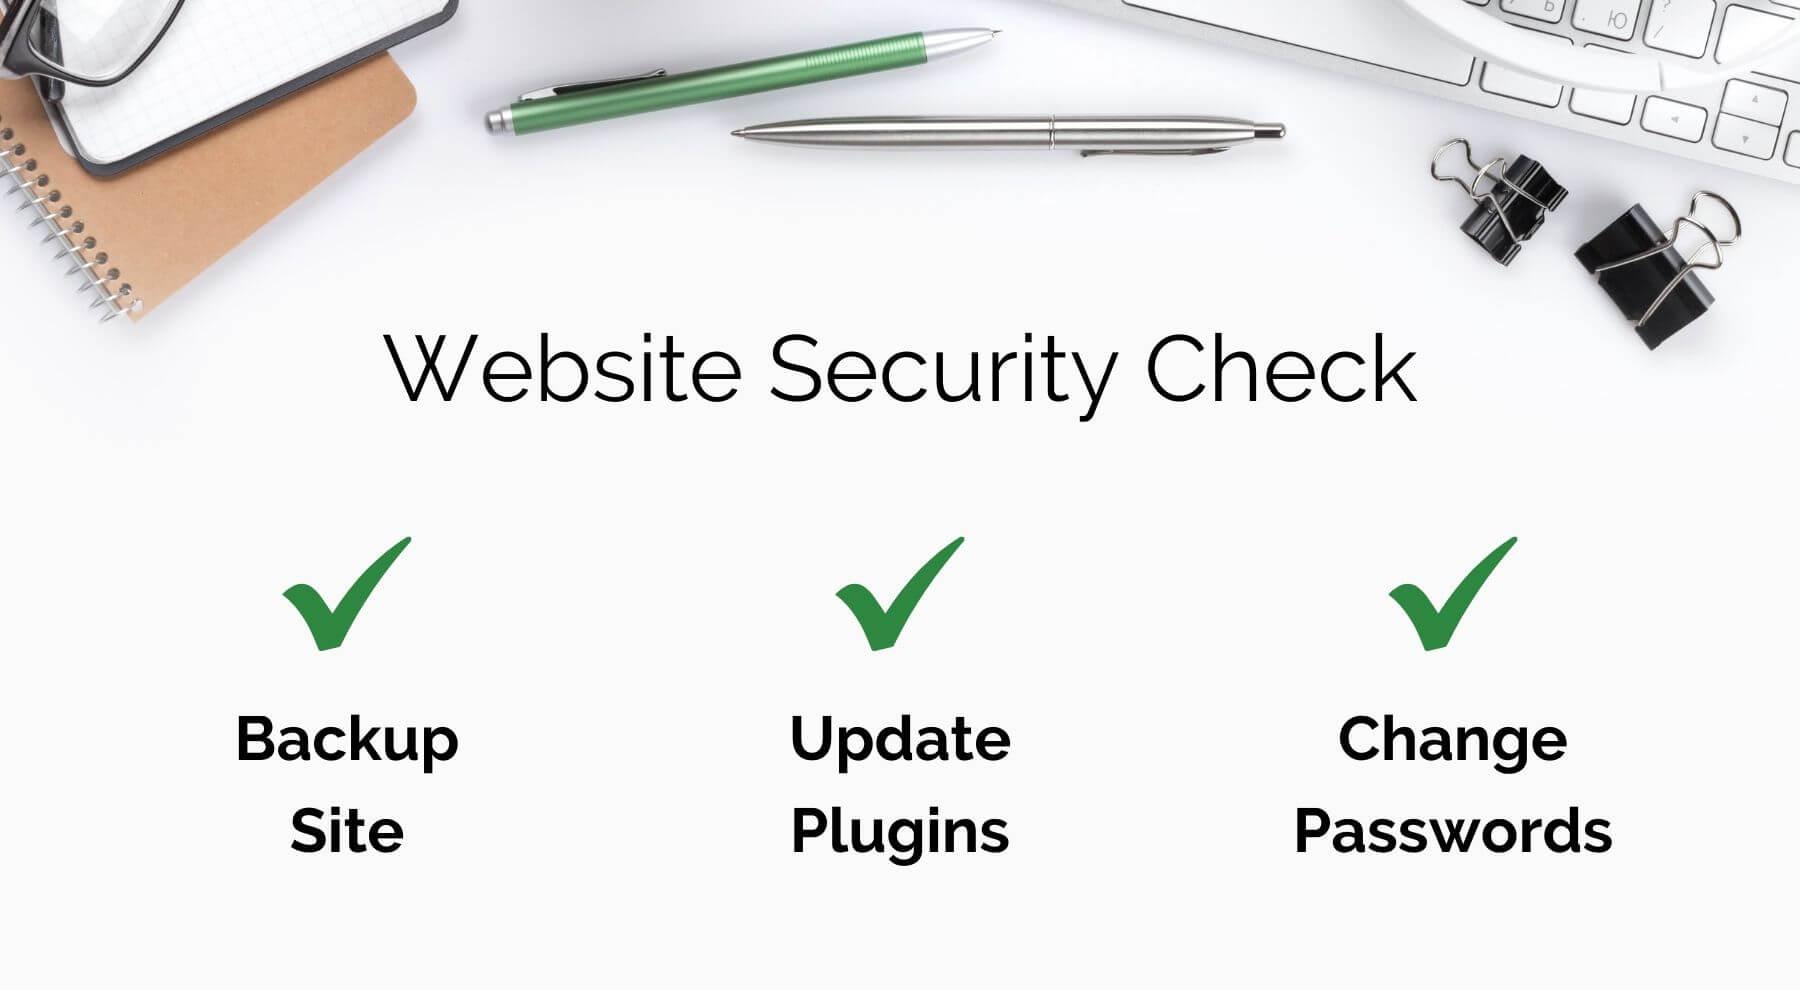 Website security checklist: backup site, update plugins, change passwords